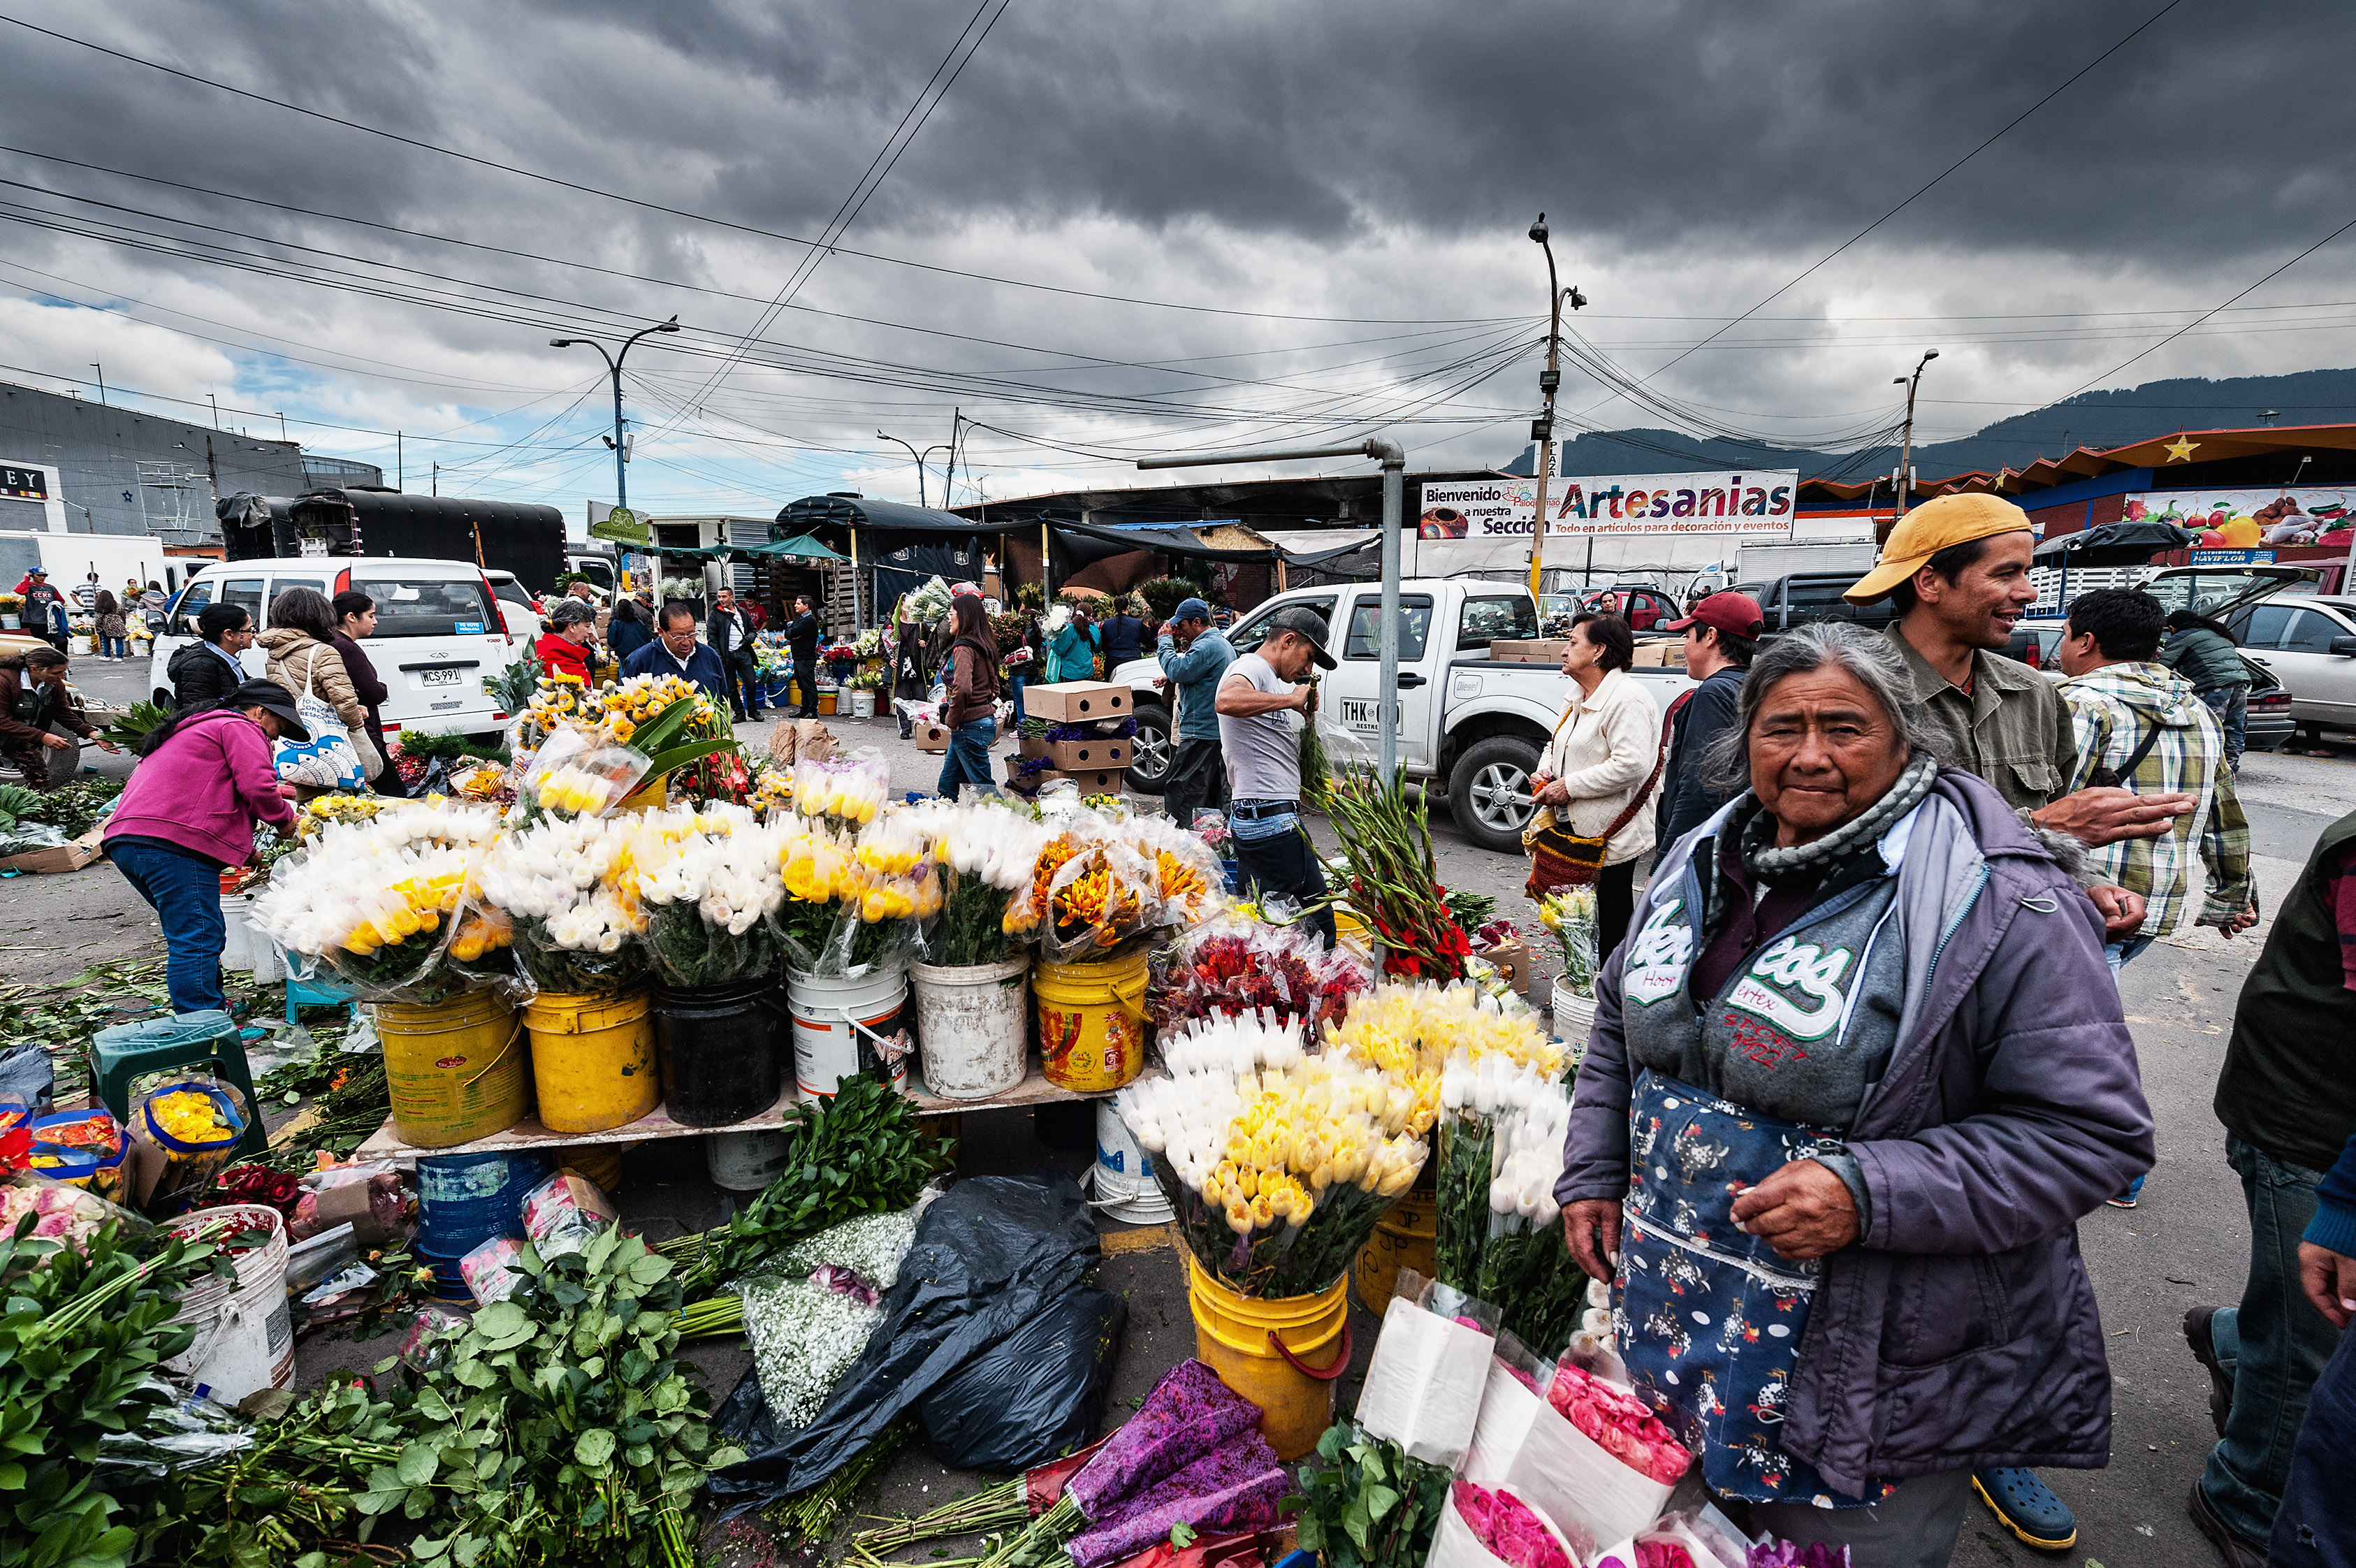 Story: Bogotá breathing again